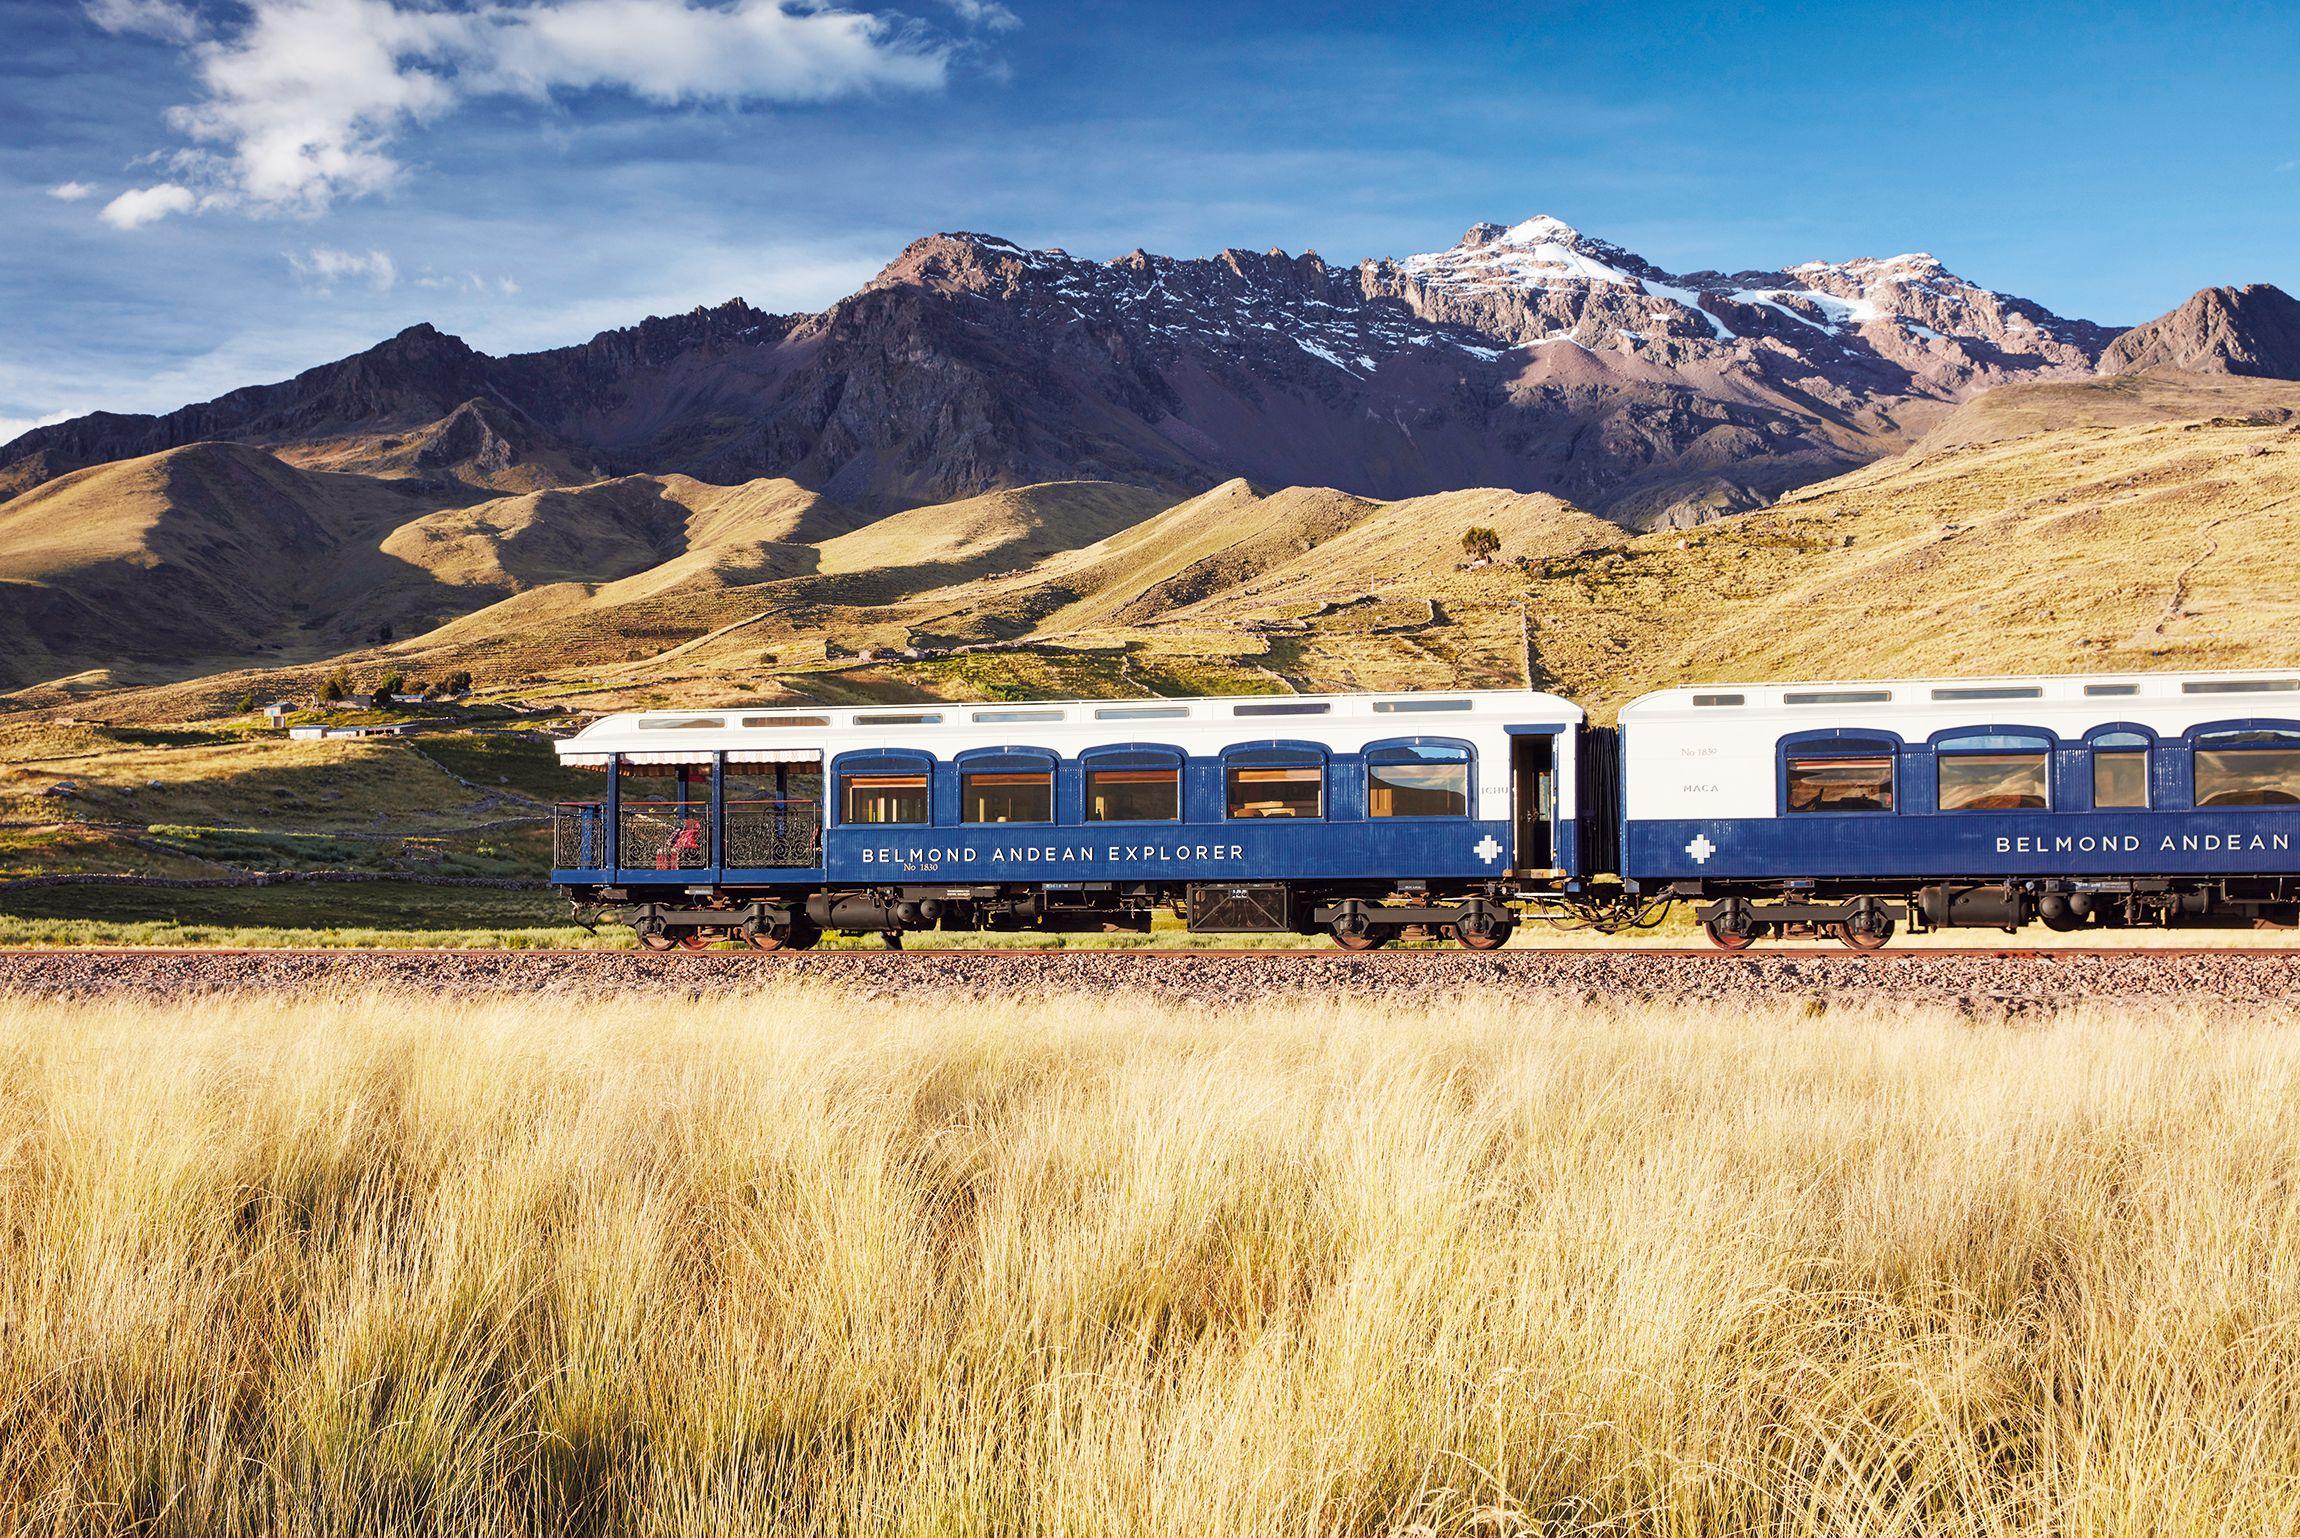 Look Inside Belmond S Retro Sleeper Trains Luxury Train Travel